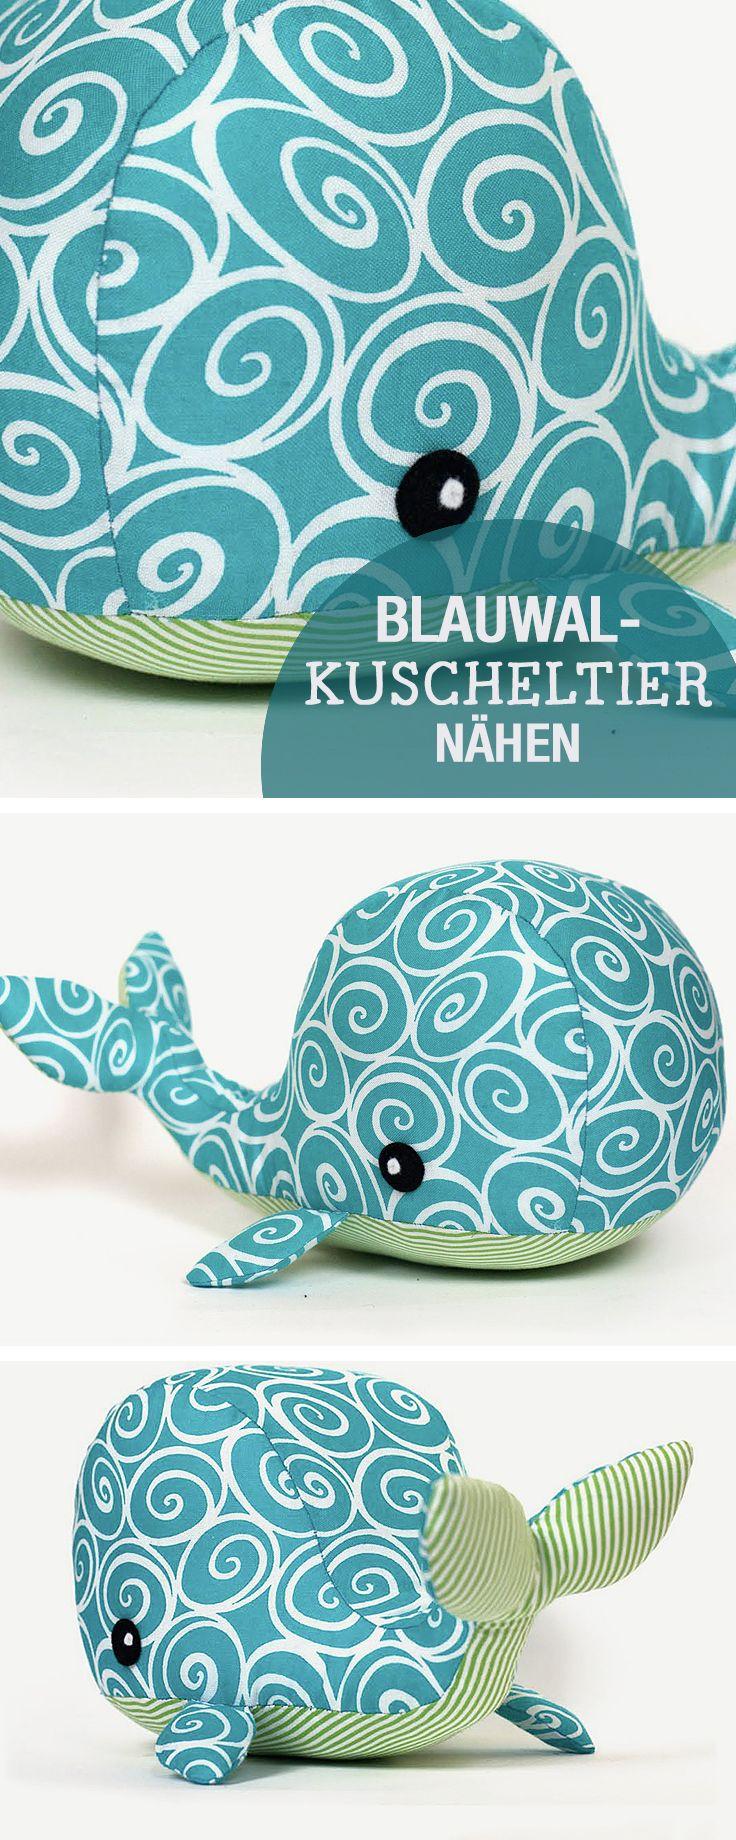 DIY-Nähanleitung: Blauwal Kuscheltier nähen, Nähen für Kinder / diy sewing tutorial: whale soft toy, kids sewing ideas via DaWanda.com #sewingtoys